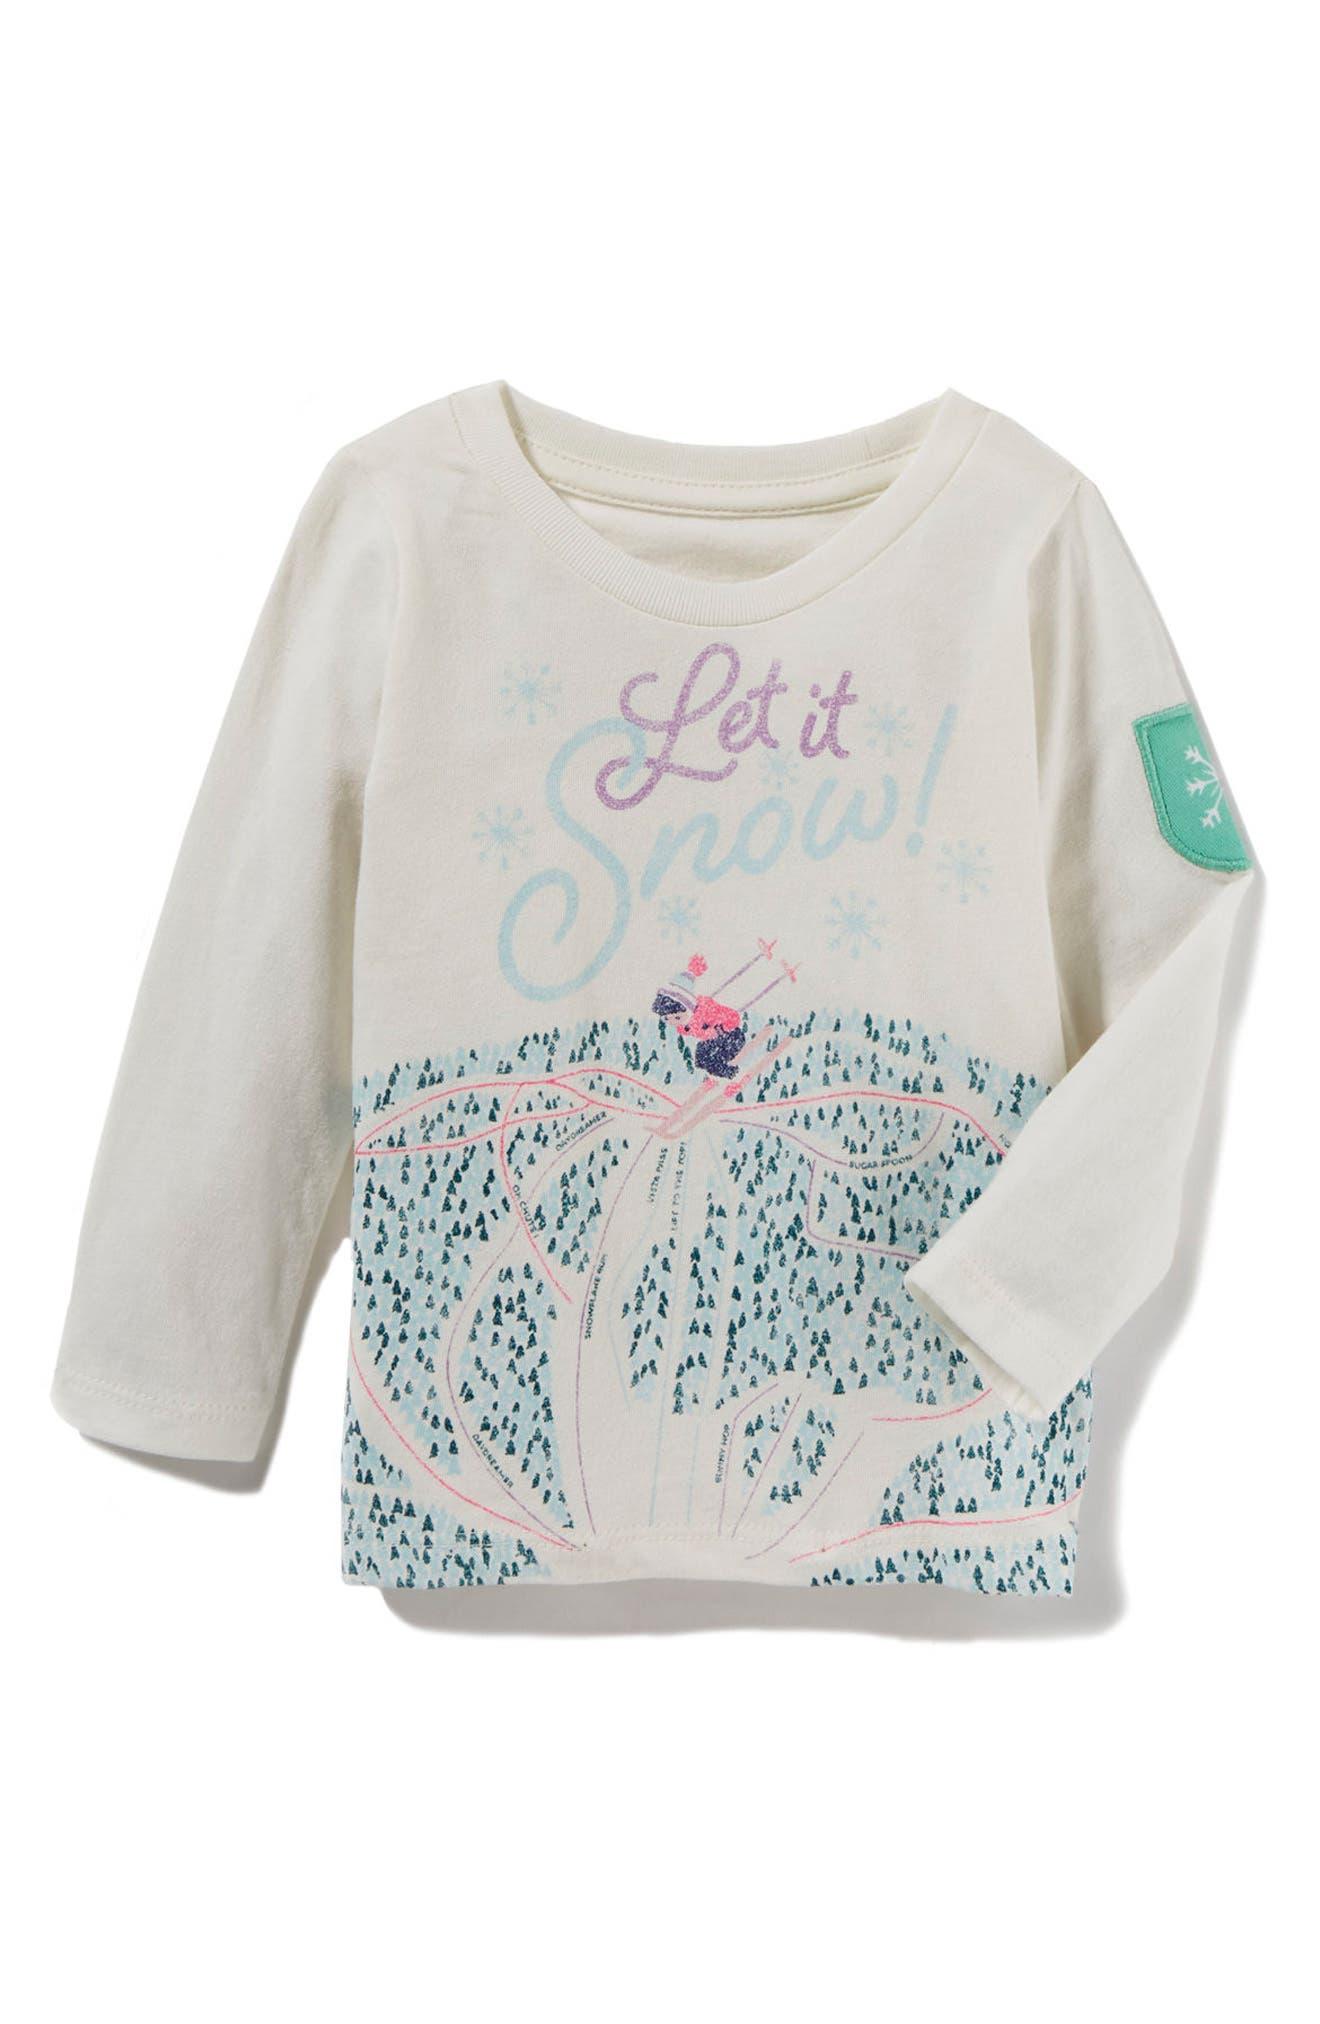 Alternate Image 1 Selected - Peek Let It Snow Graphic Tee (Baby Girls)